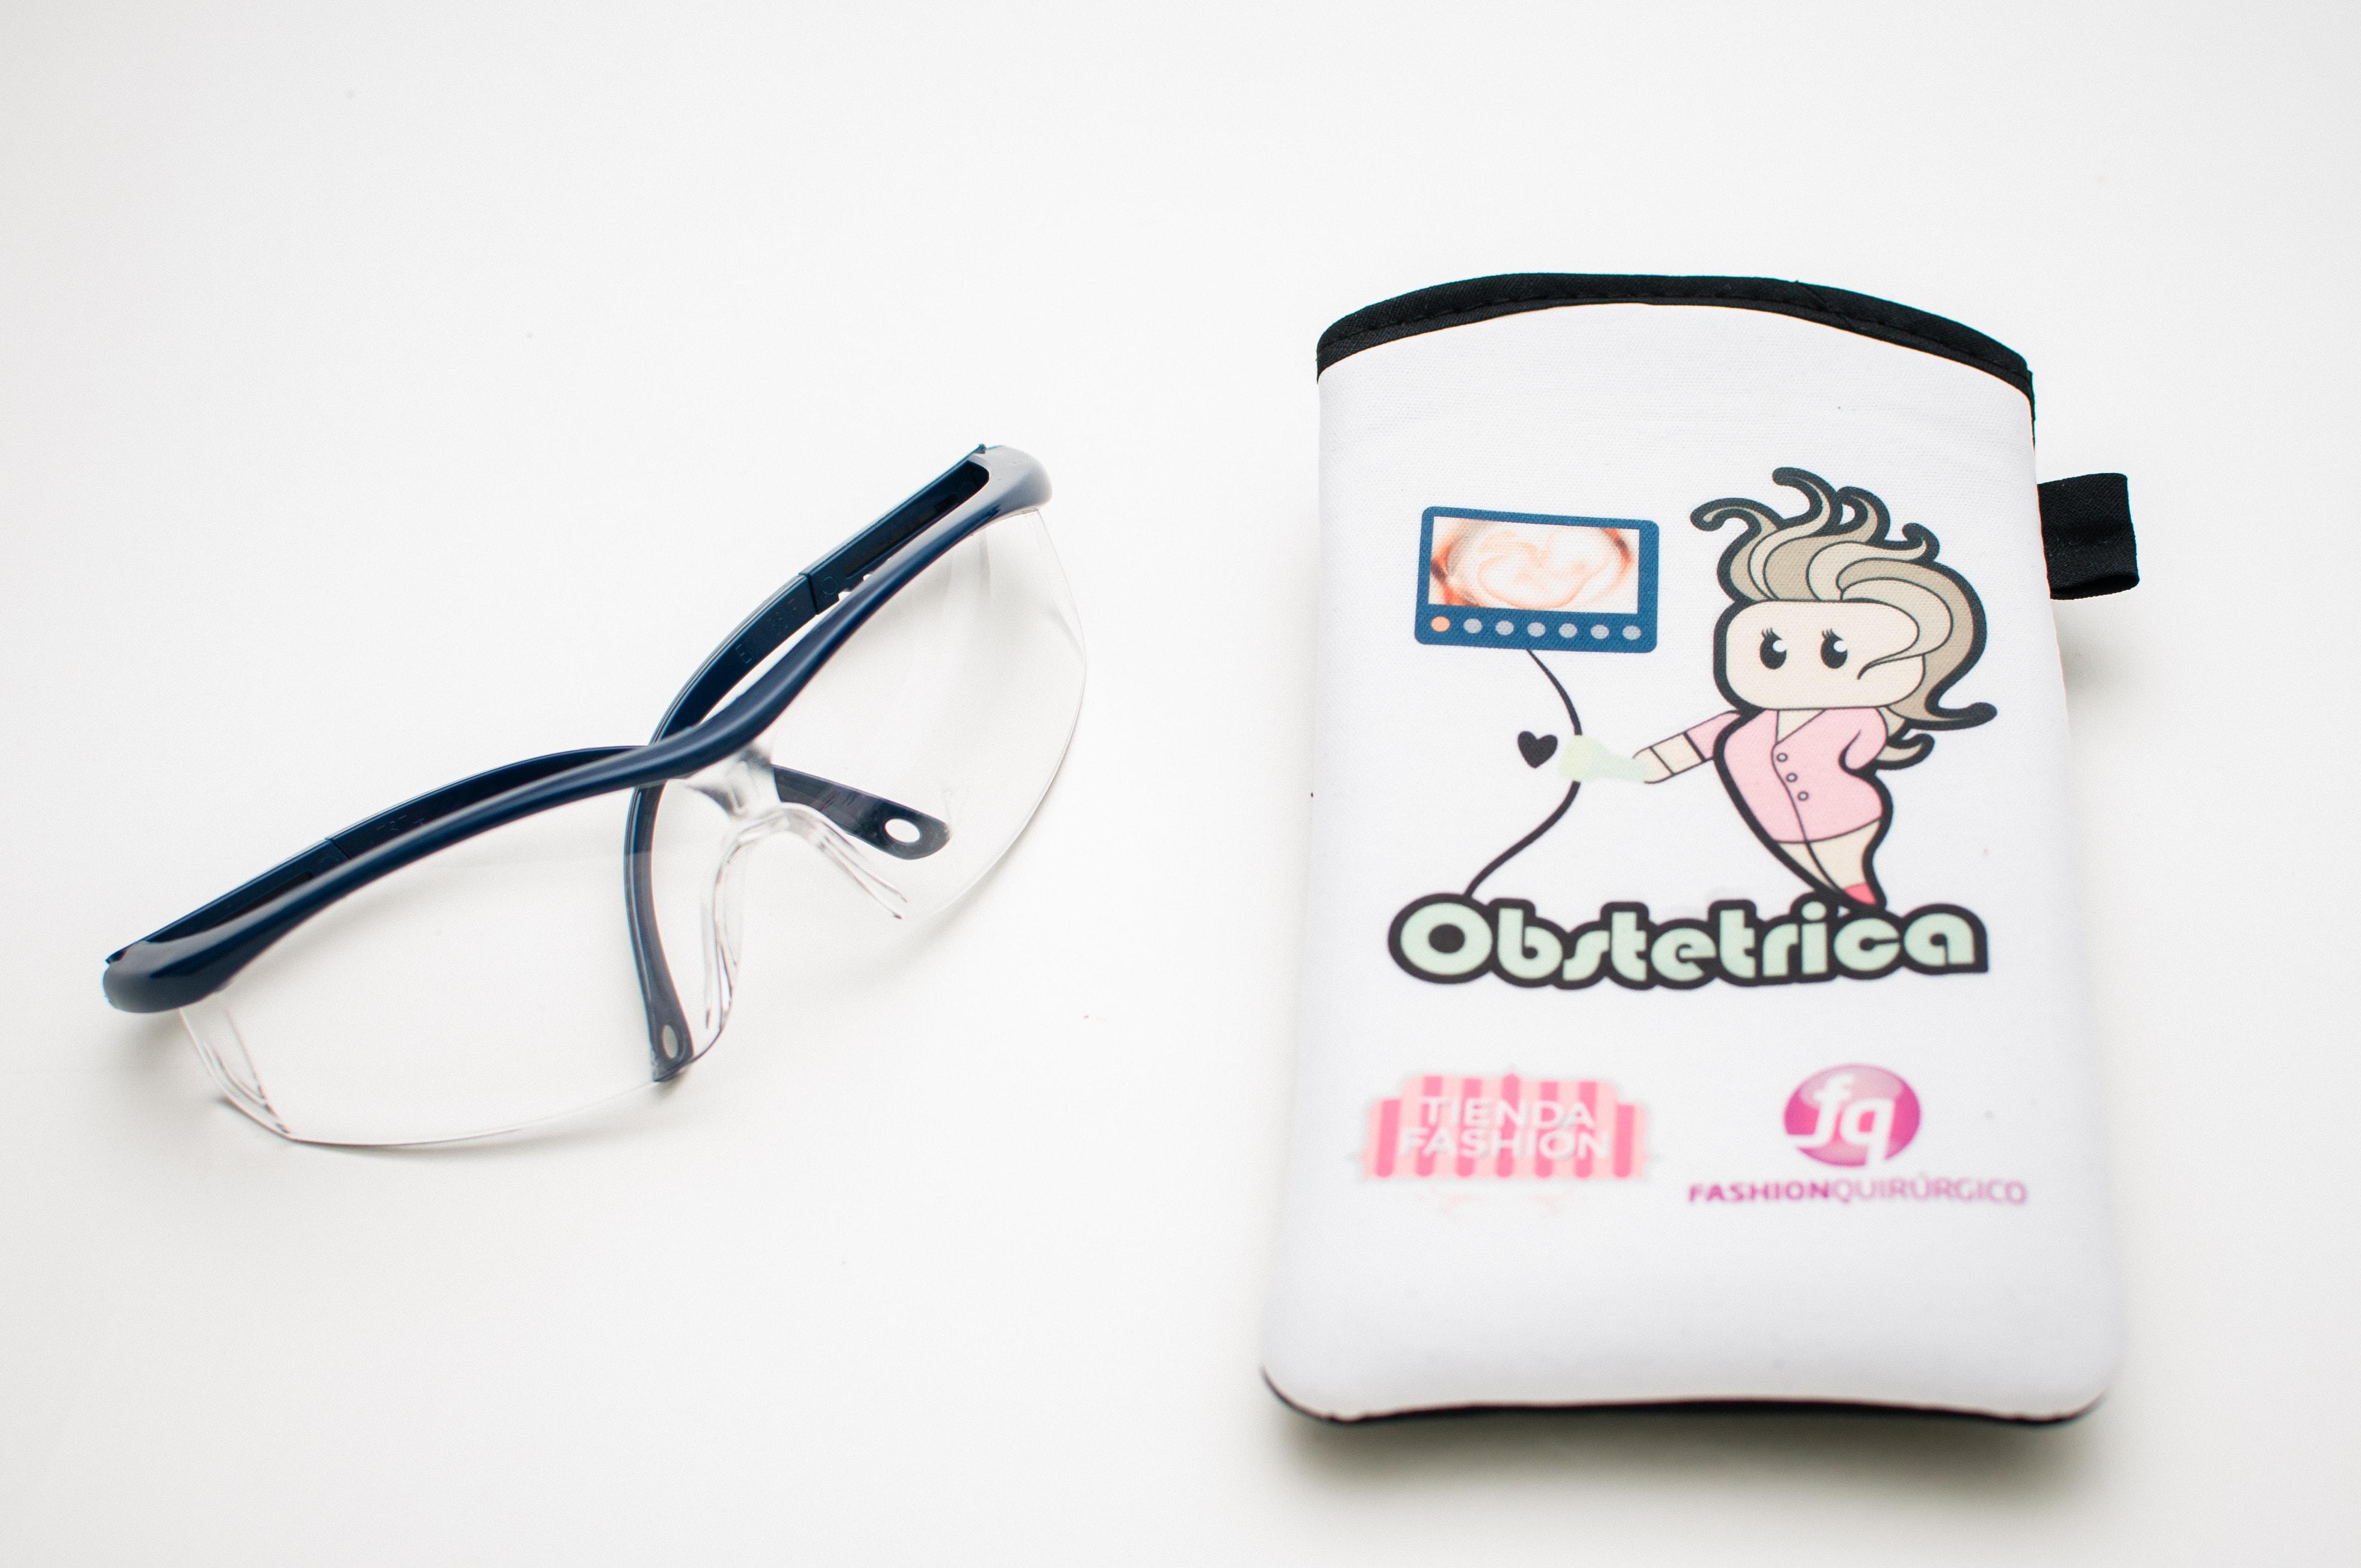 Obstetrica - Estuche Anteojos de seguridad